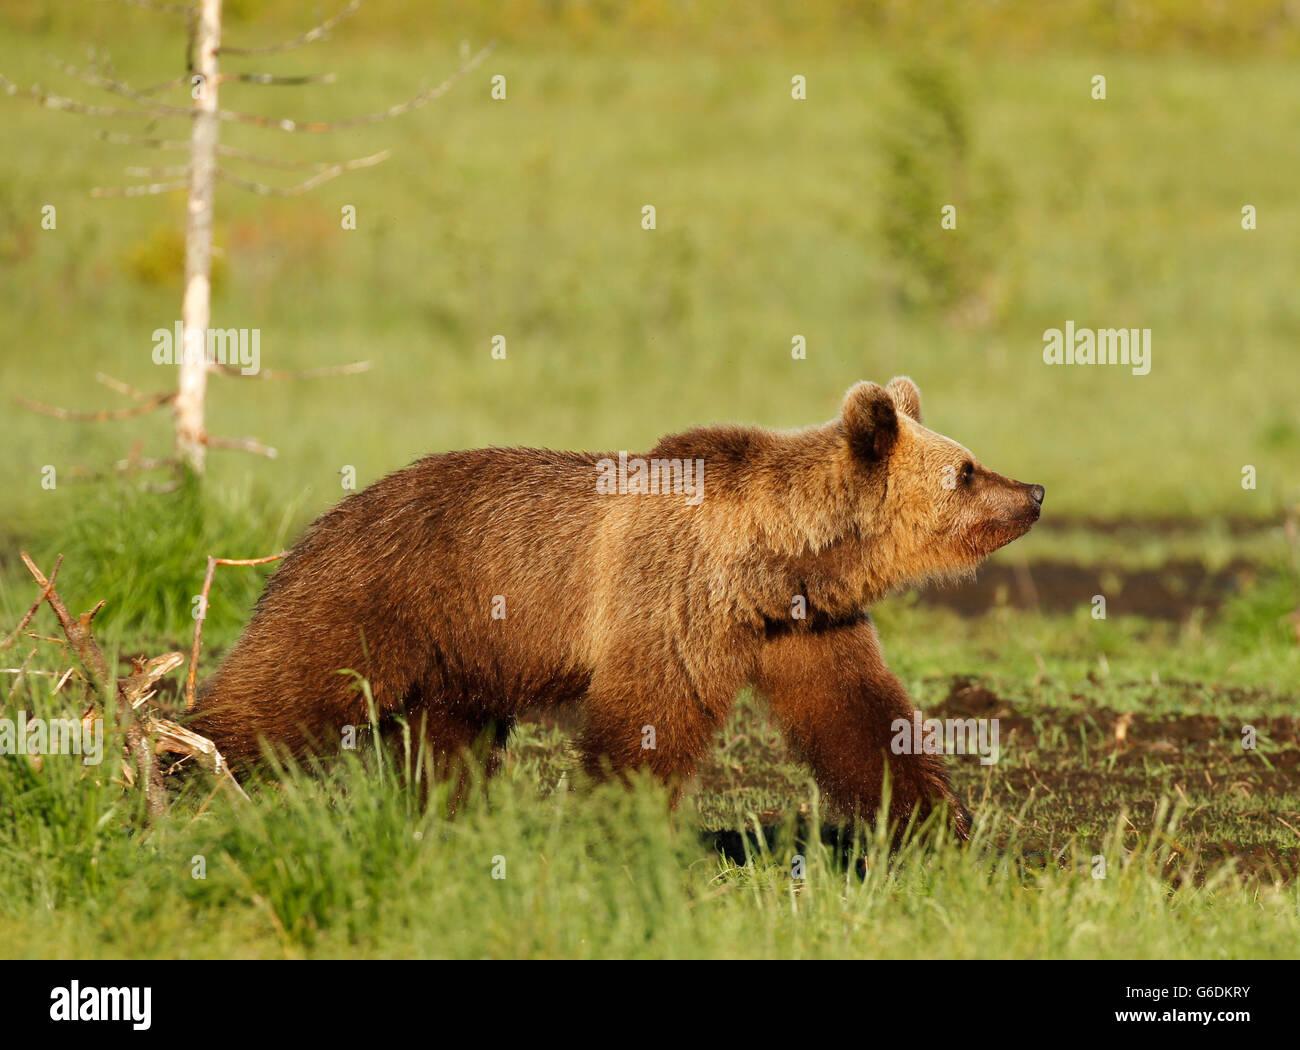 Eurasian Brown Bear (Ursus arctos arctos) in Kuusamo in Finland, near the Russian border. Stock Photo